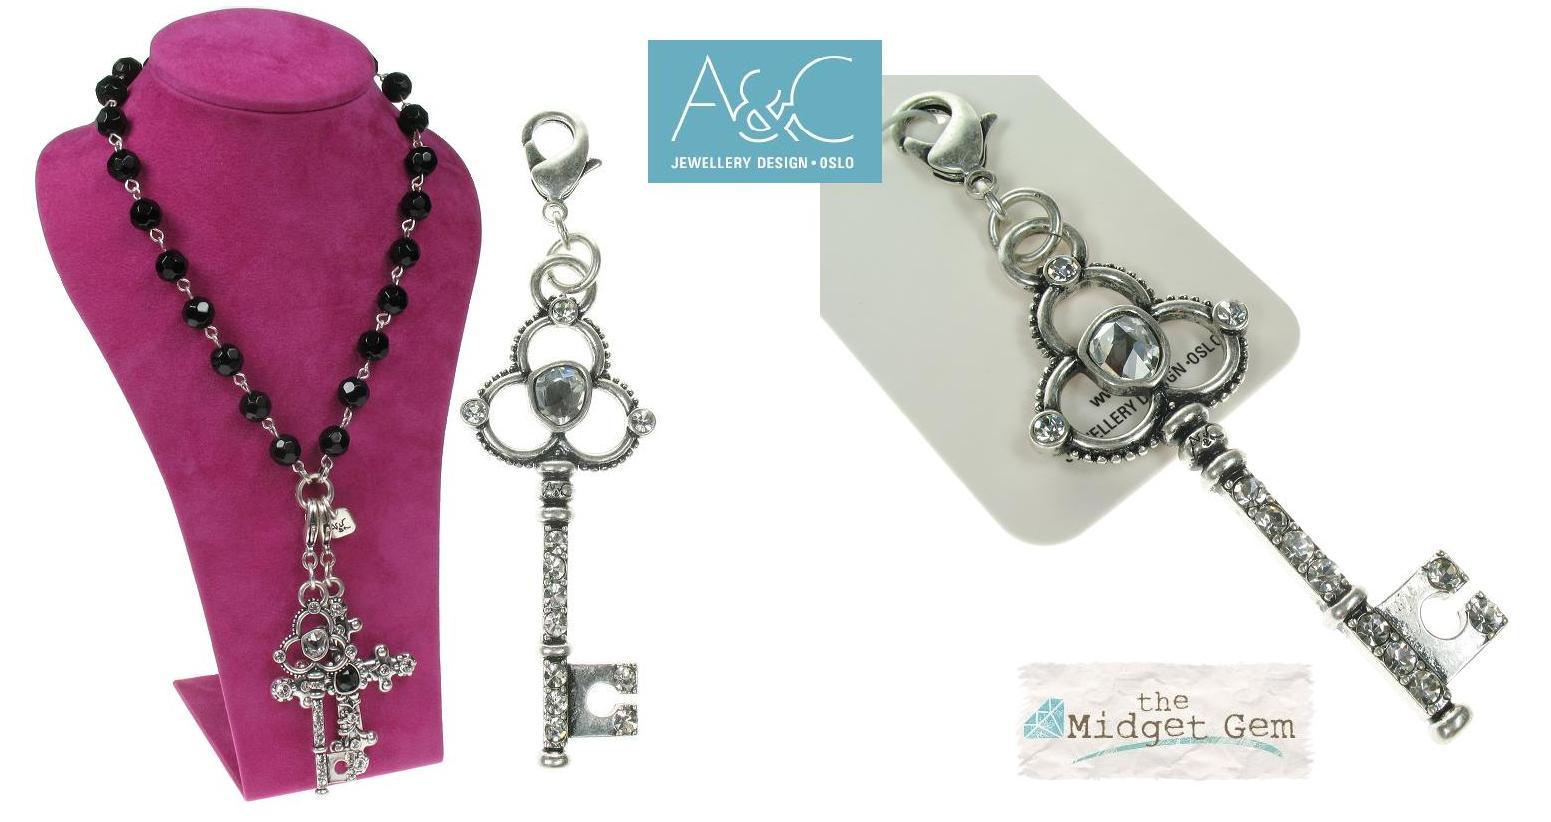 A & C - Large Ornate Crystal Studded Key Clasp-On Charm